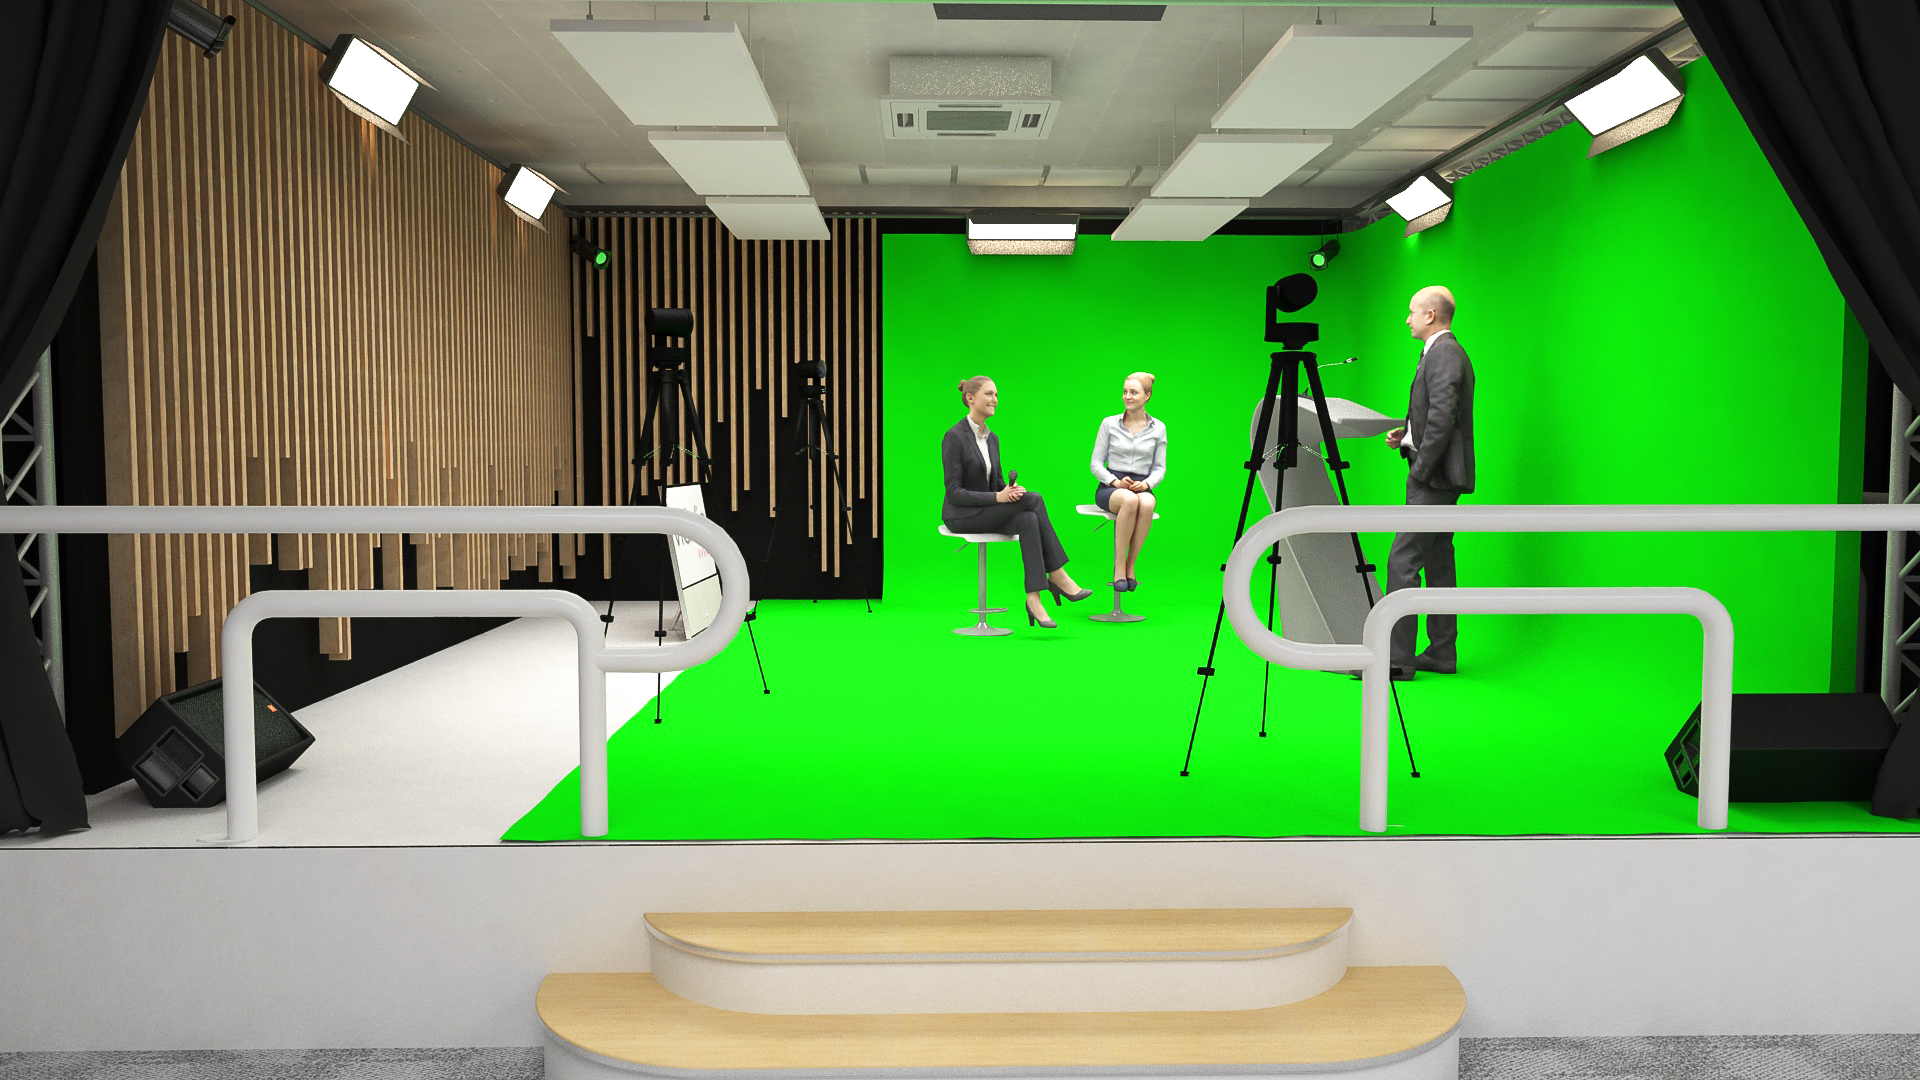 location studio d'enregistrement